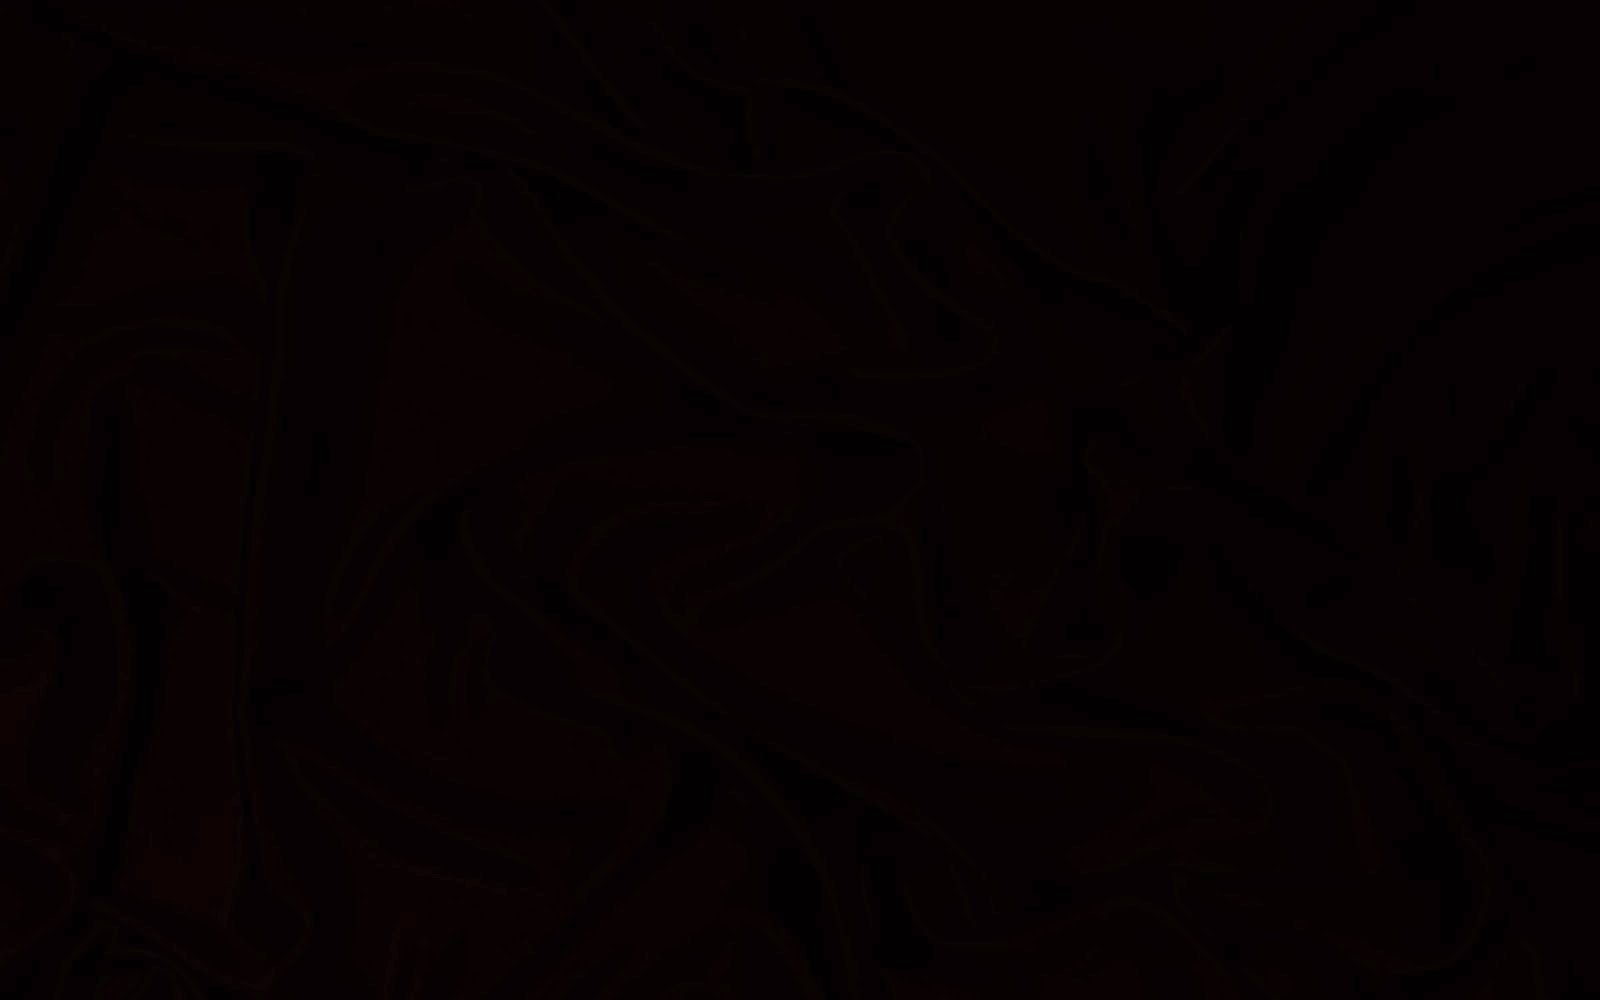 black wallpaper wallpaper